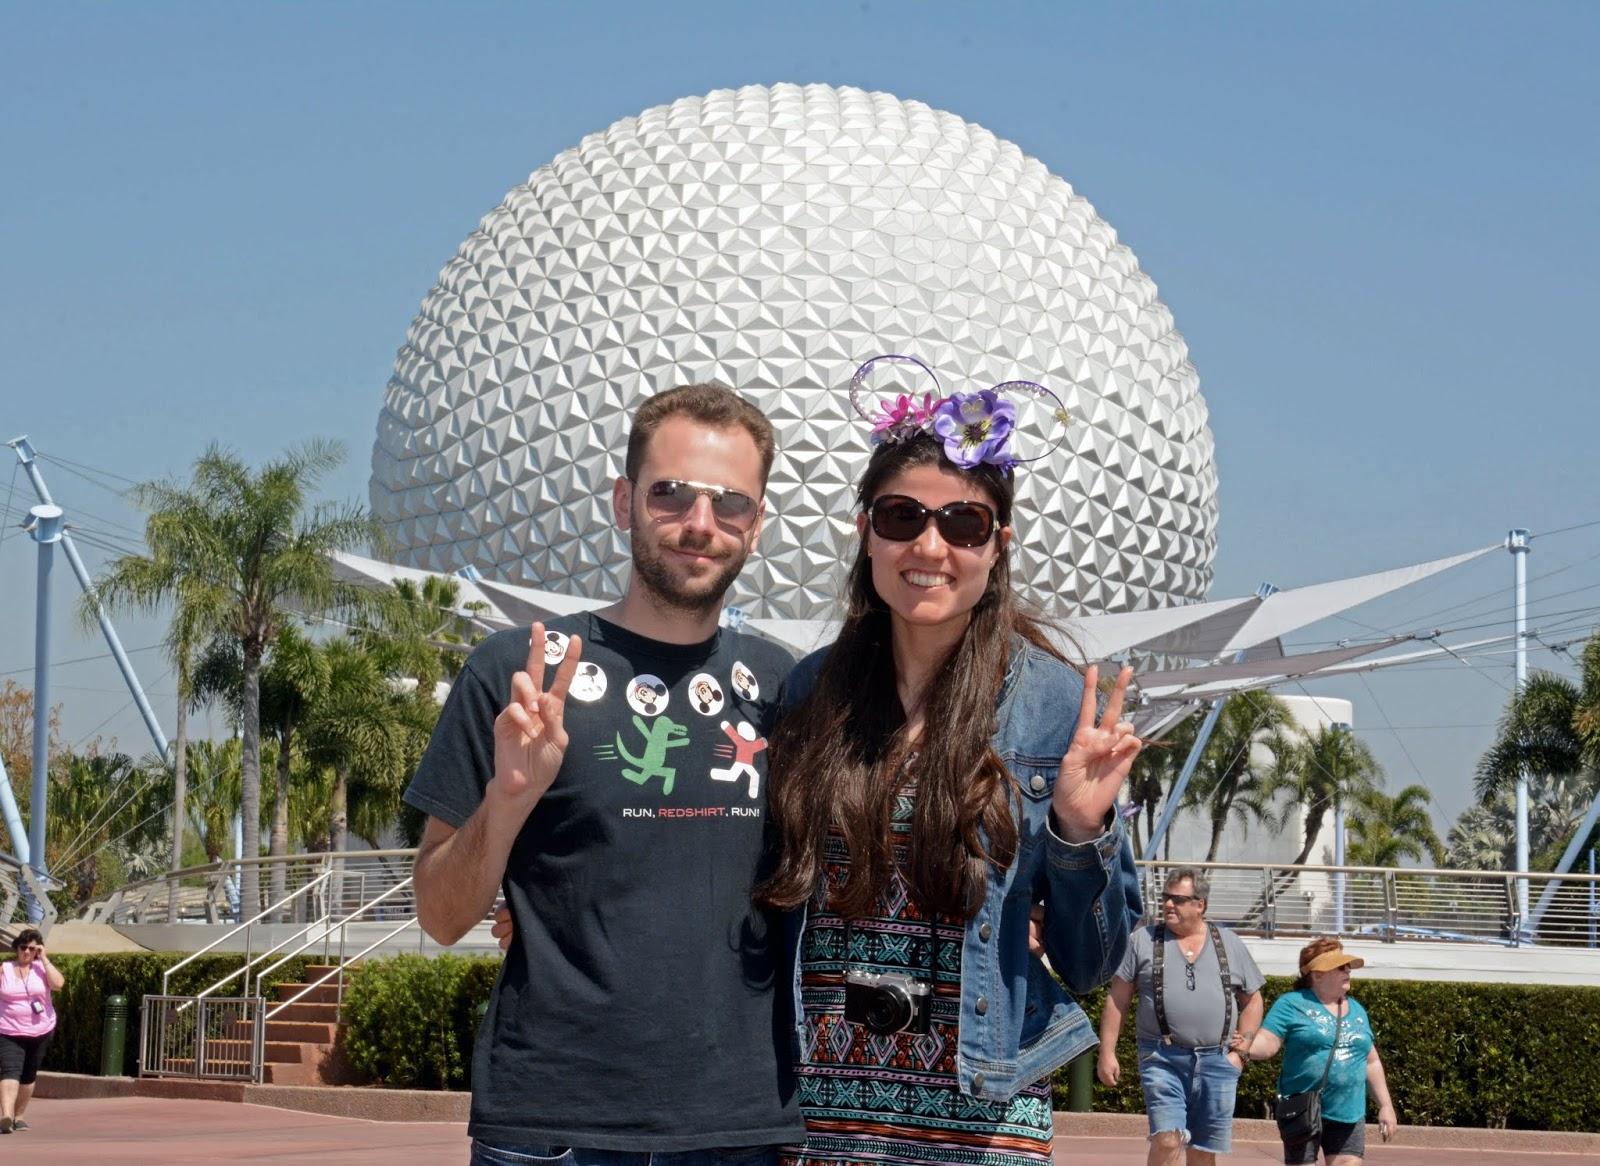 Our second park of the Walt Disney World 4 park challenge: Epcot